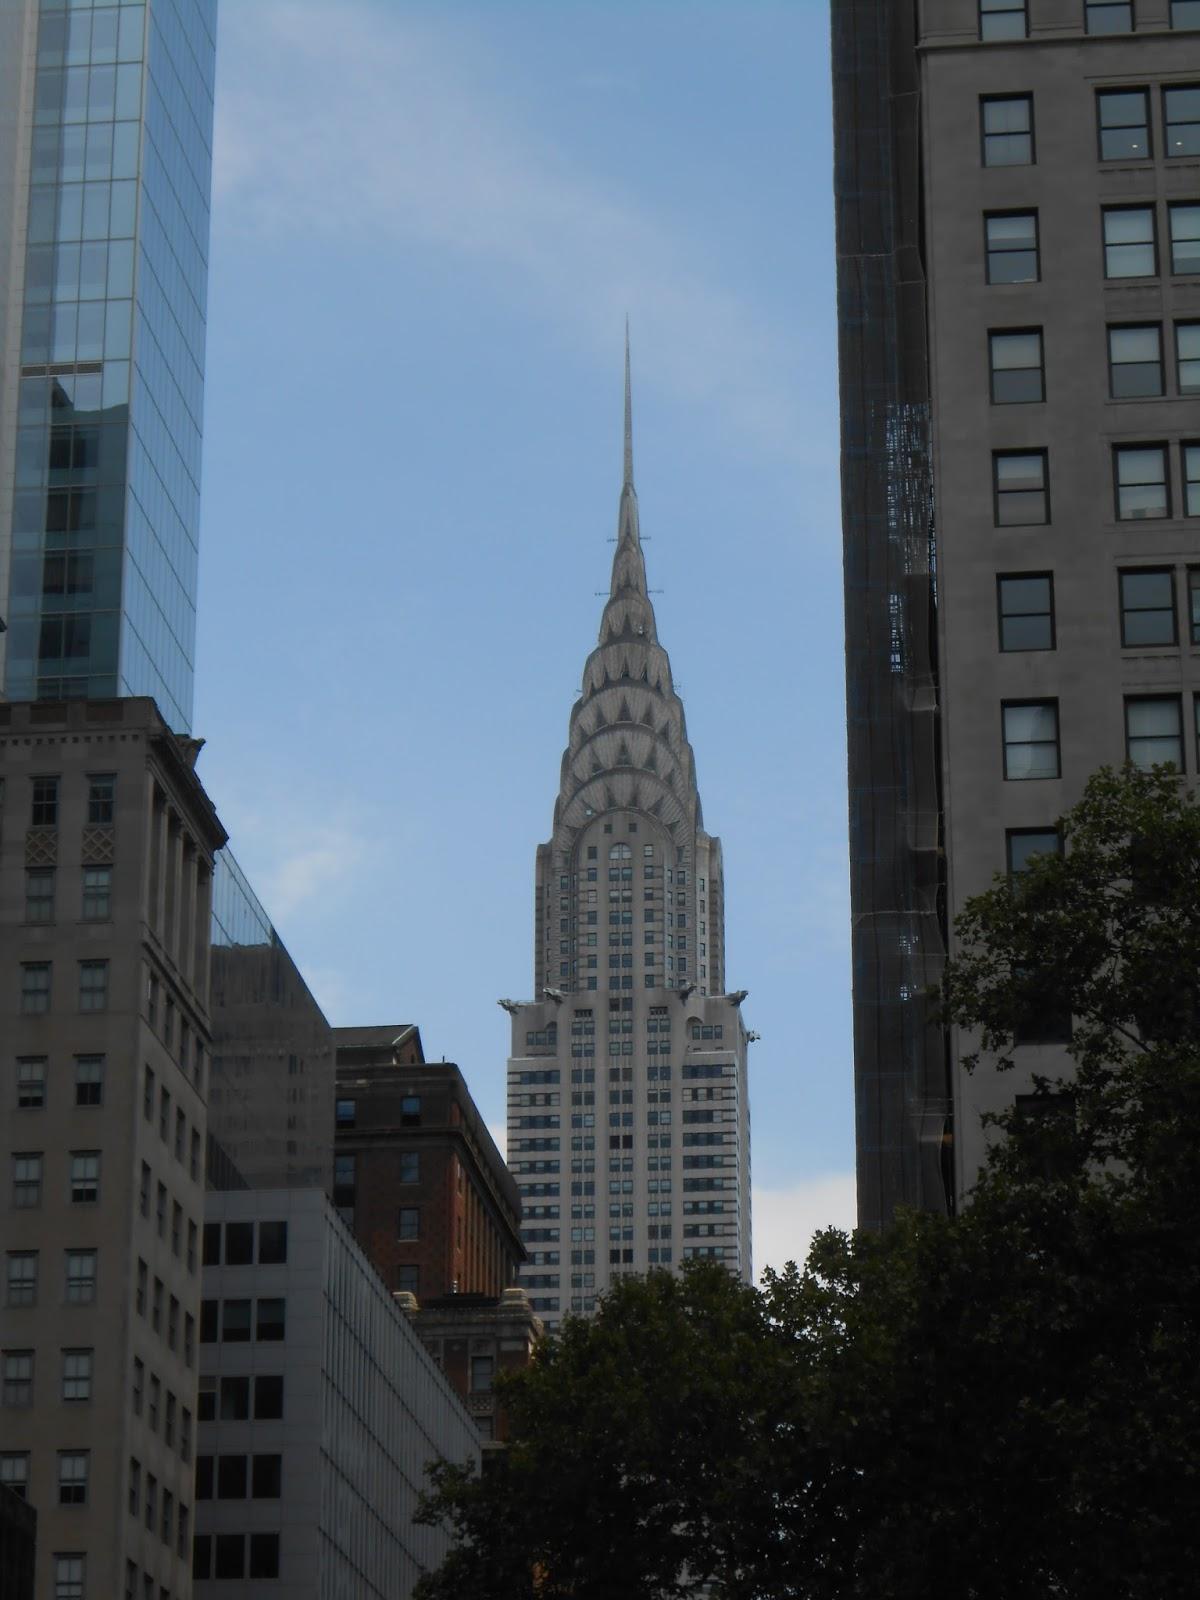 Aloha On My Mind: Aloha to RWA in NYC - A Stroll Up Fifth Avenue